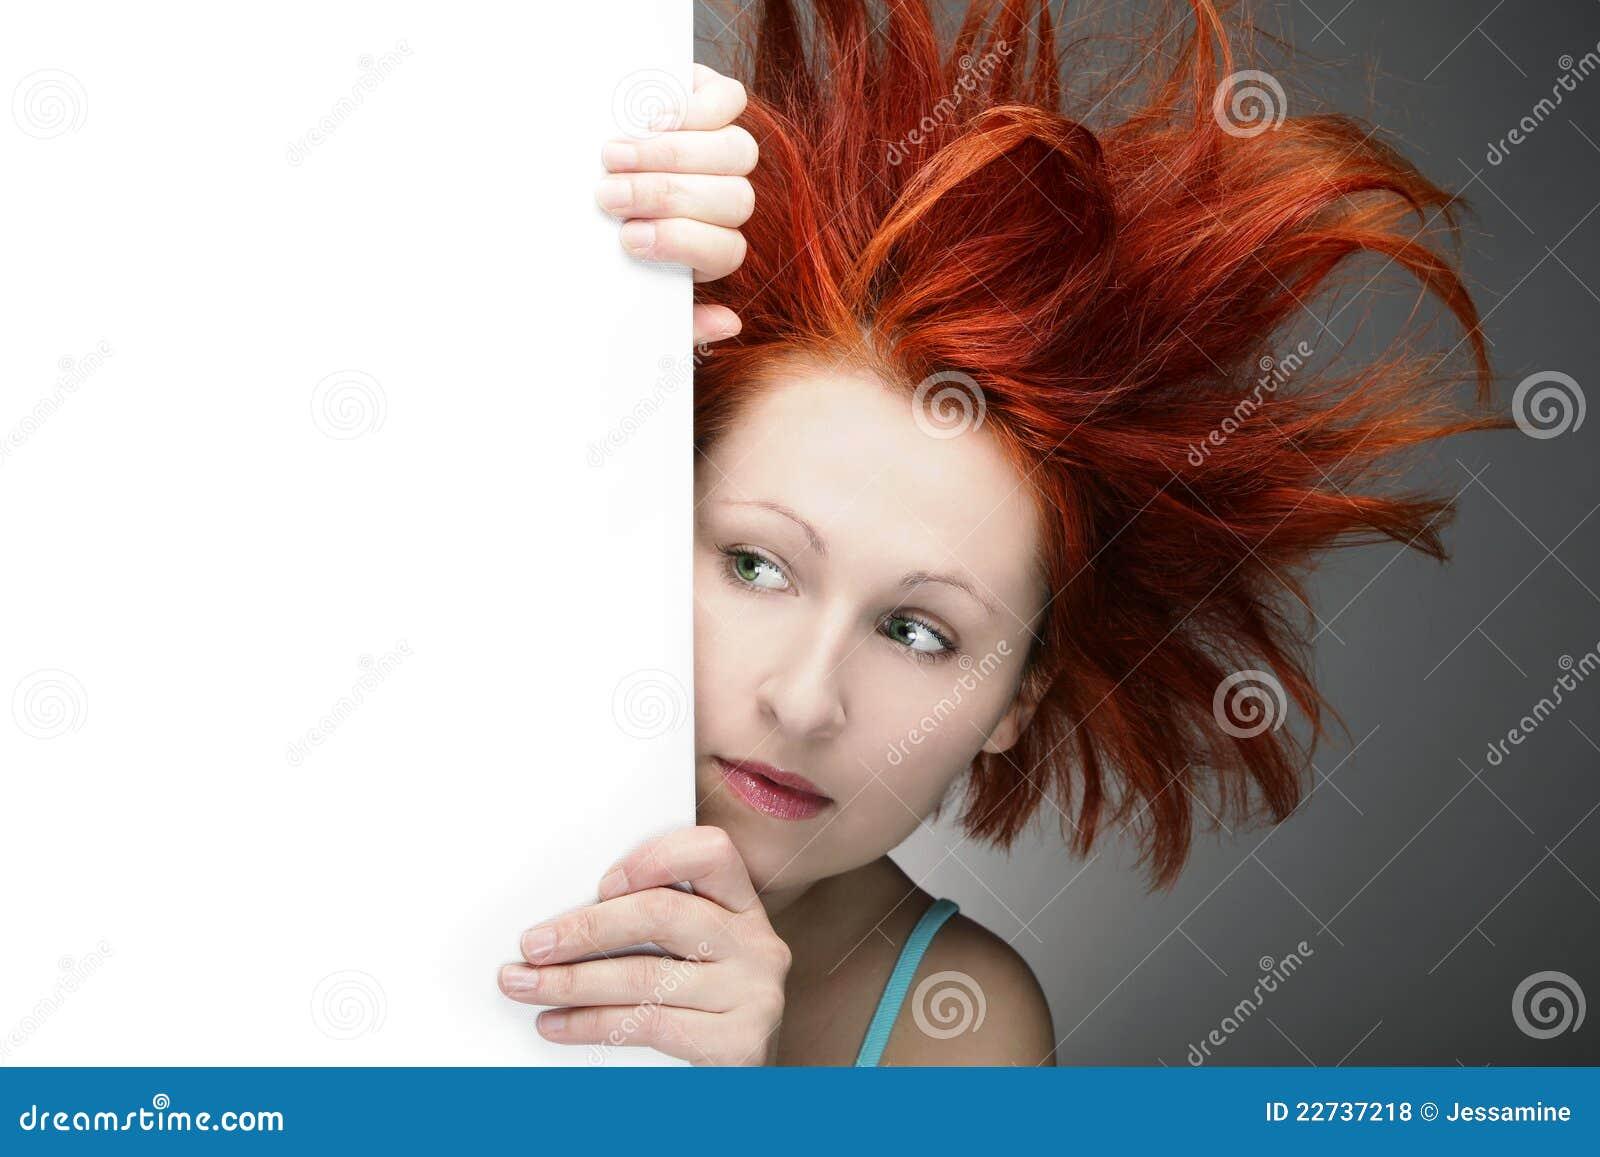 bad hair day royalty free stock photos image 22737218